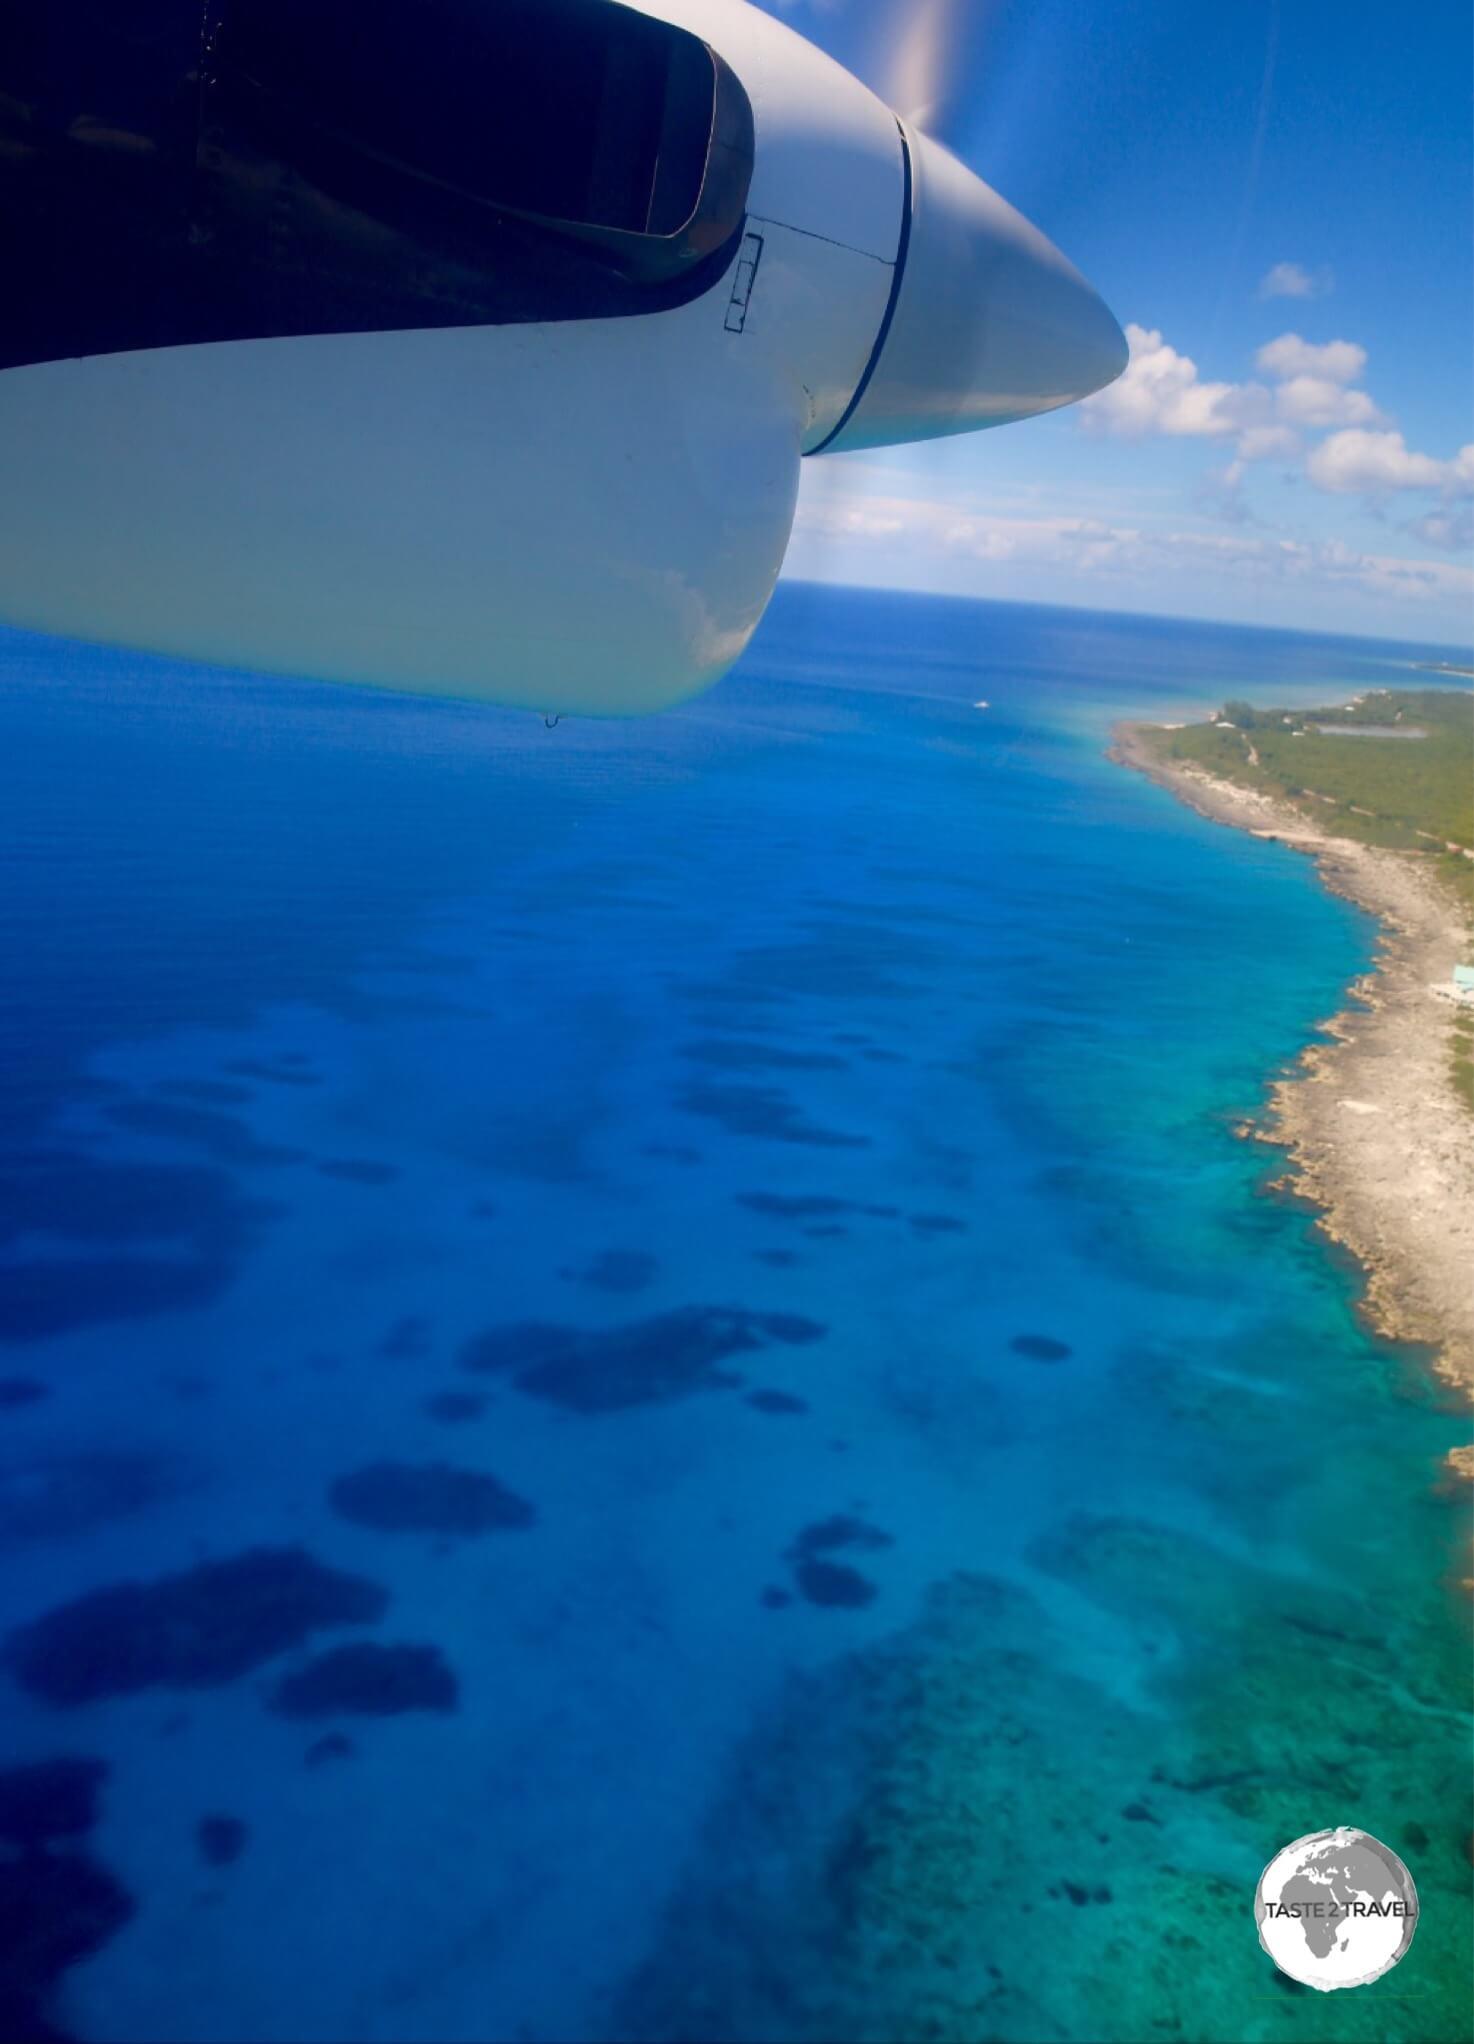 On approach to Cayman Brac.